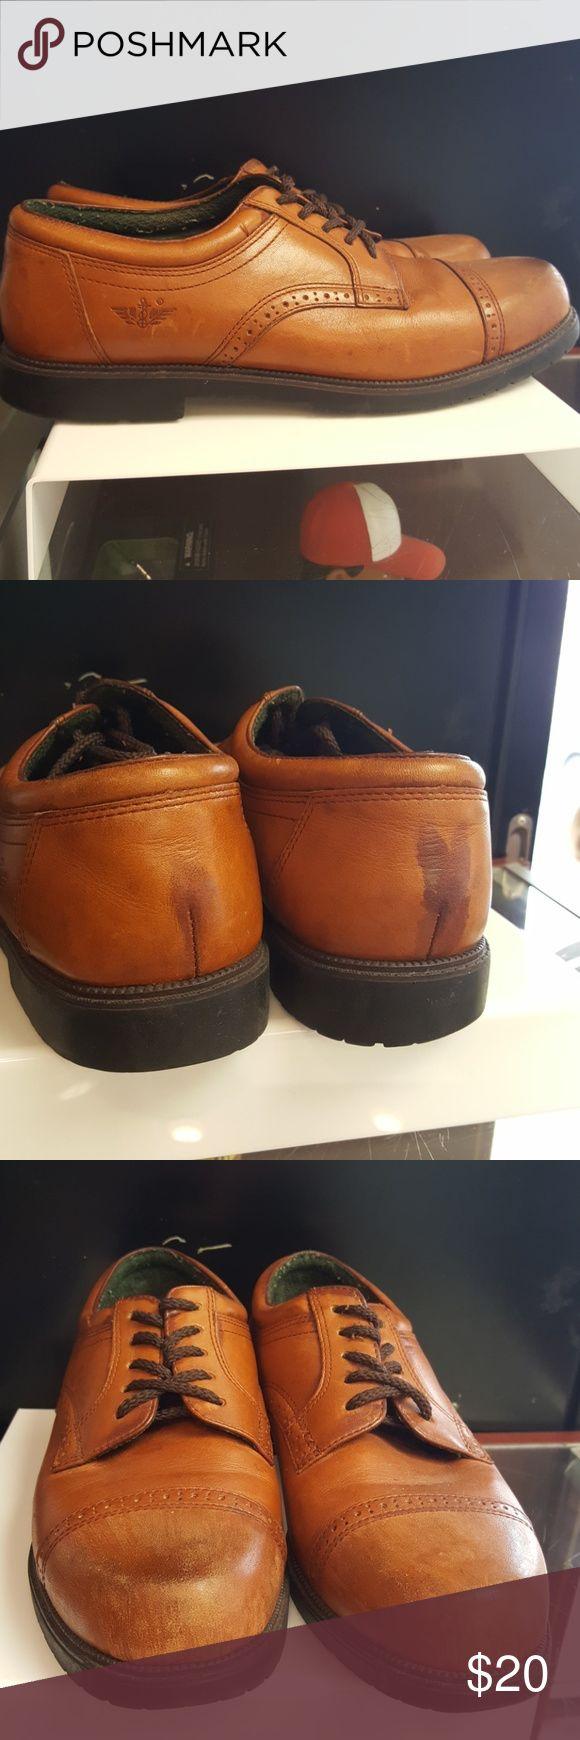 Dockers means dress shoes Dockers means dress shoes Dockers Shoes Oxfords & Derbys